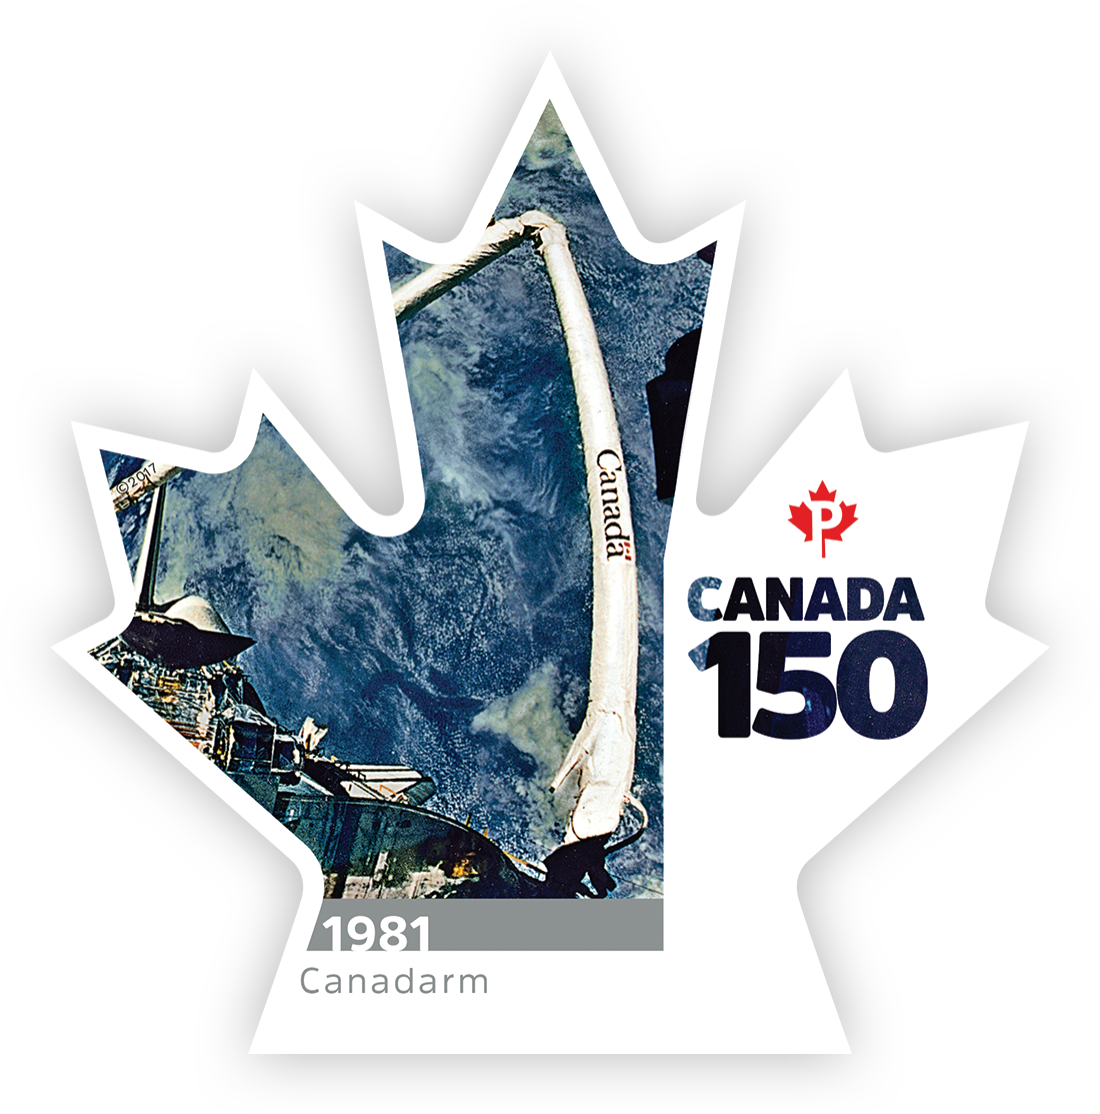 Canadarm - Canada 150 Canada Postage Stamp | Canada 150